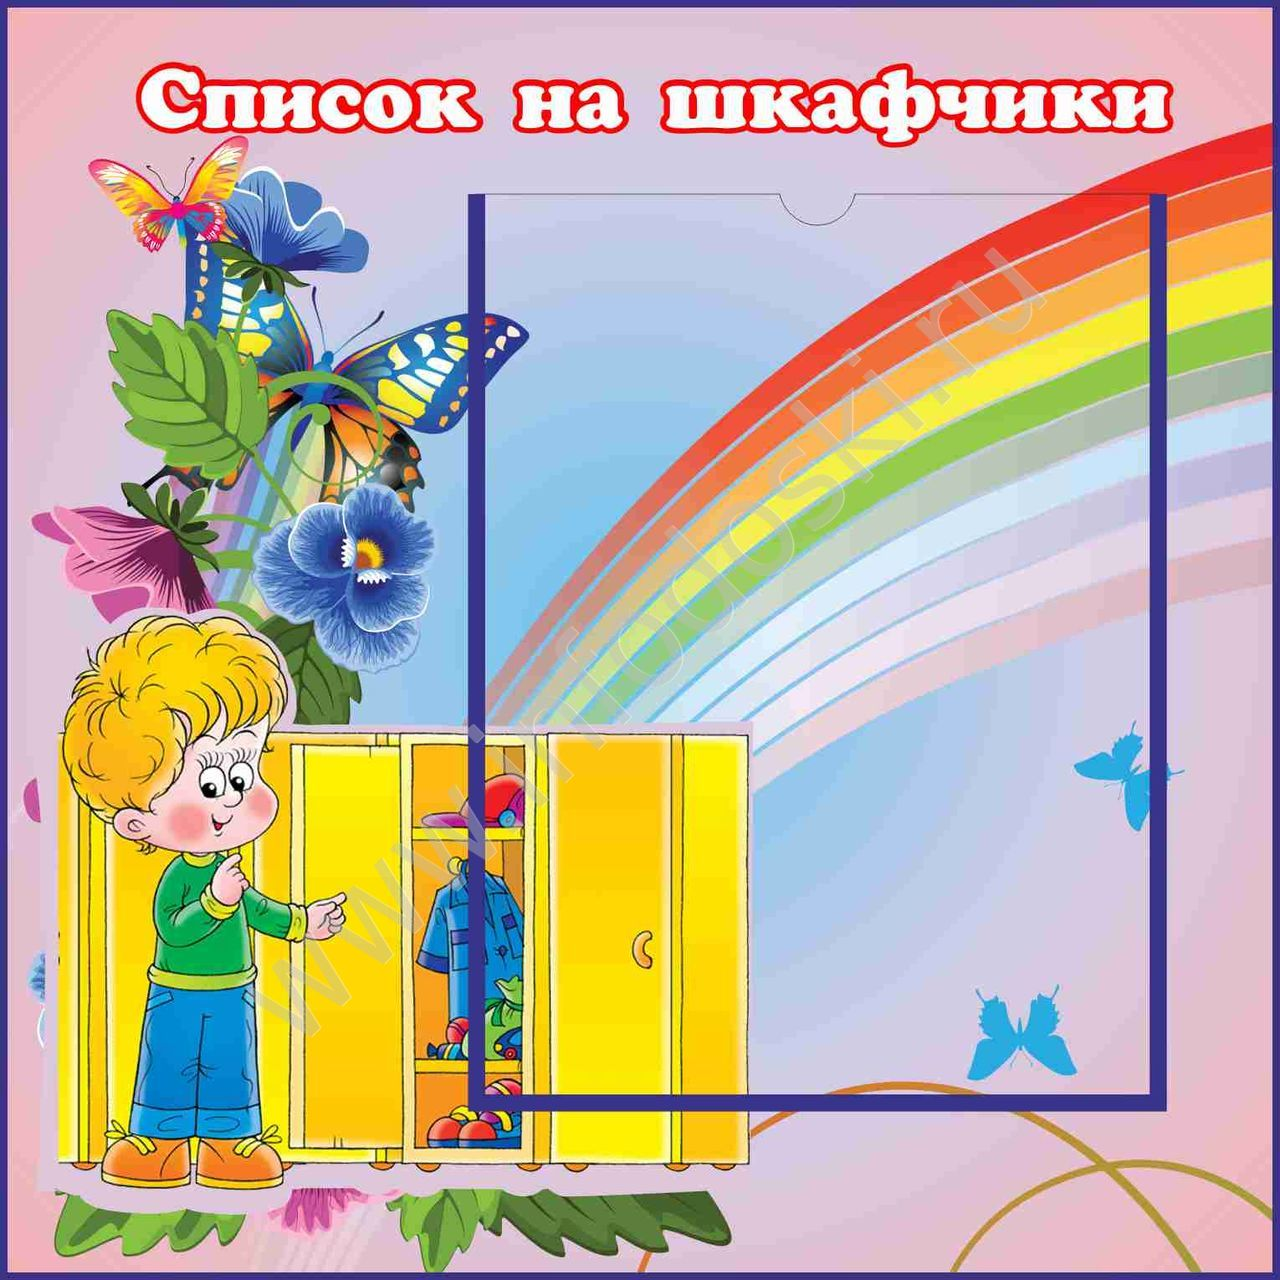 картинки для детского сада список на шкафчики